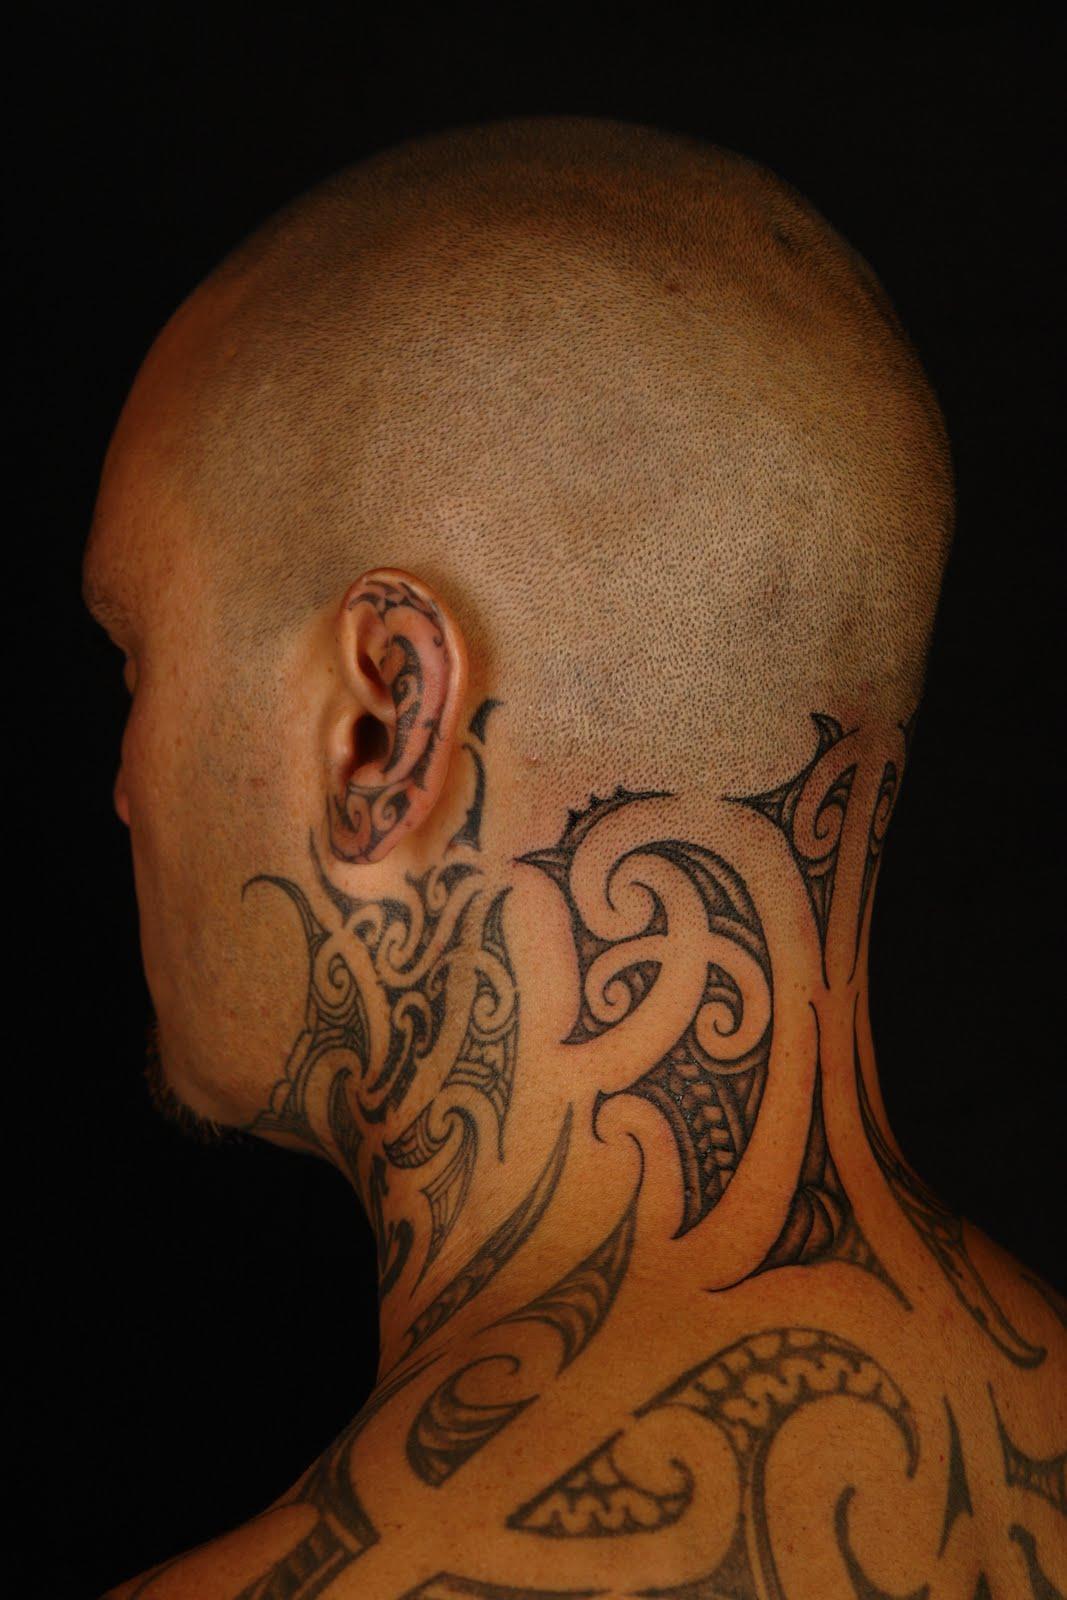 MAORI POLYNESIAN TATTOO: Tiki Taane Neck Tattoo